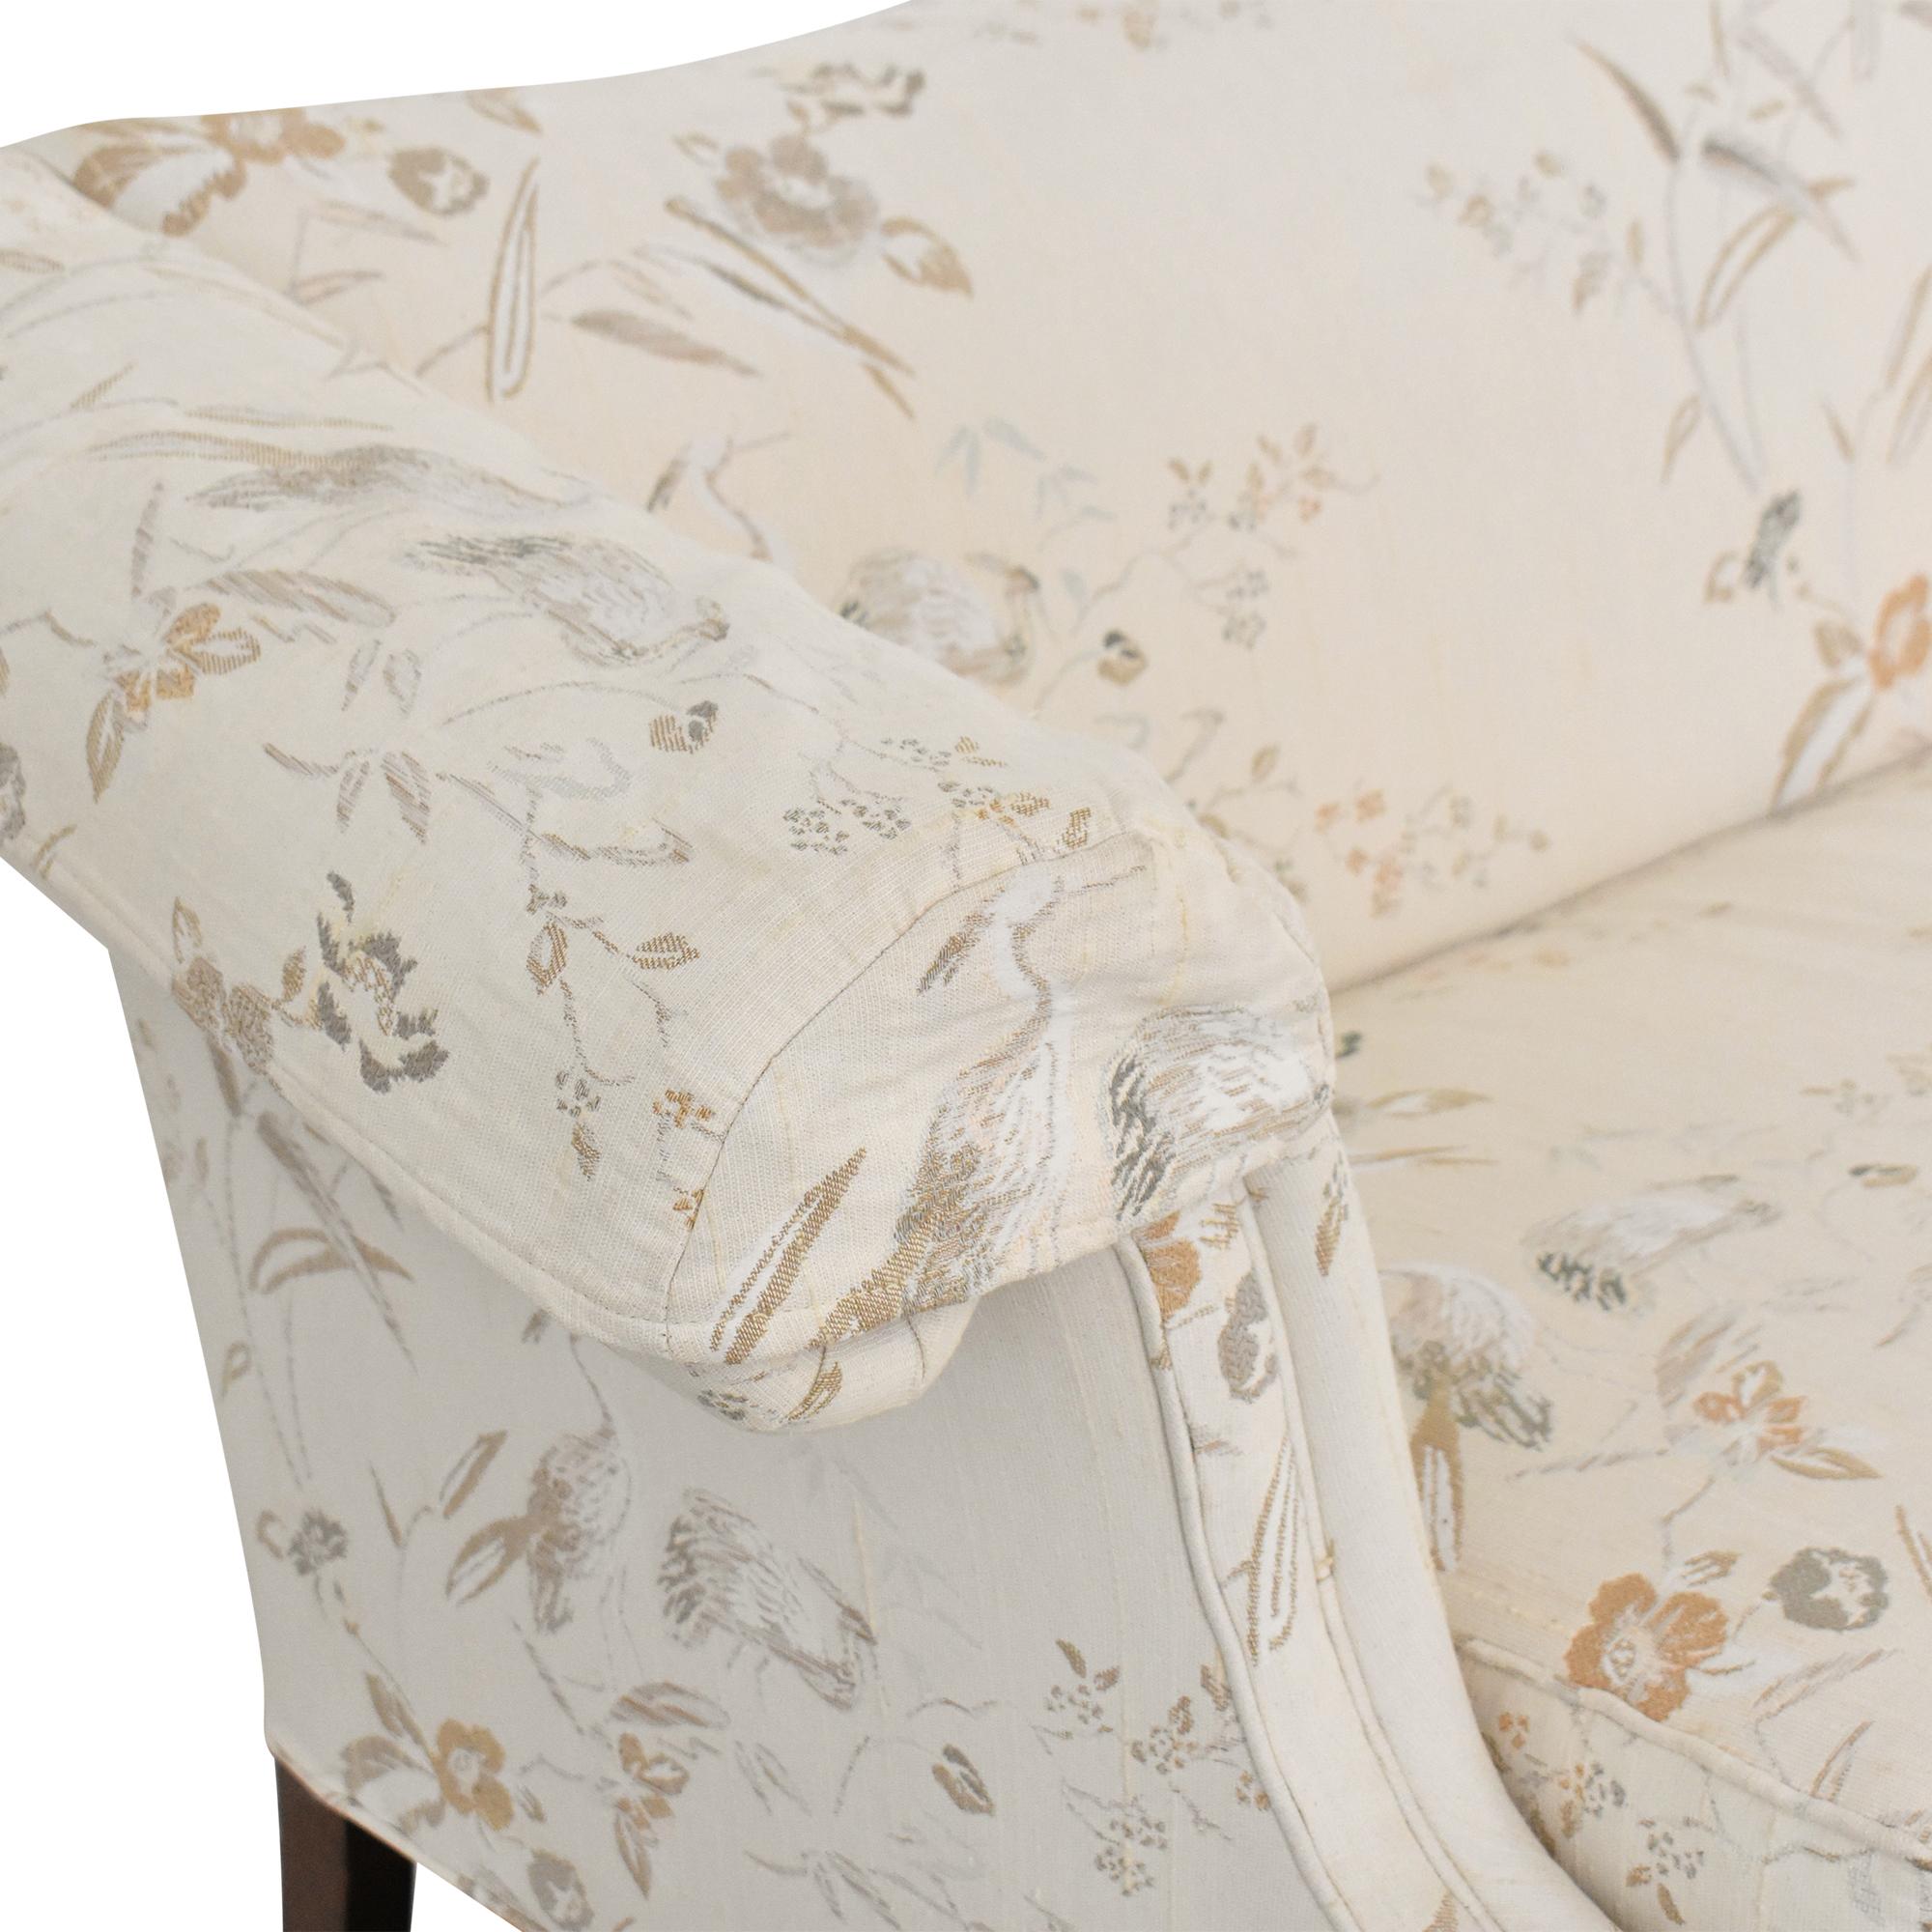 Sherrill Furniture Sherrill Furniture Camelback Sofa on sale